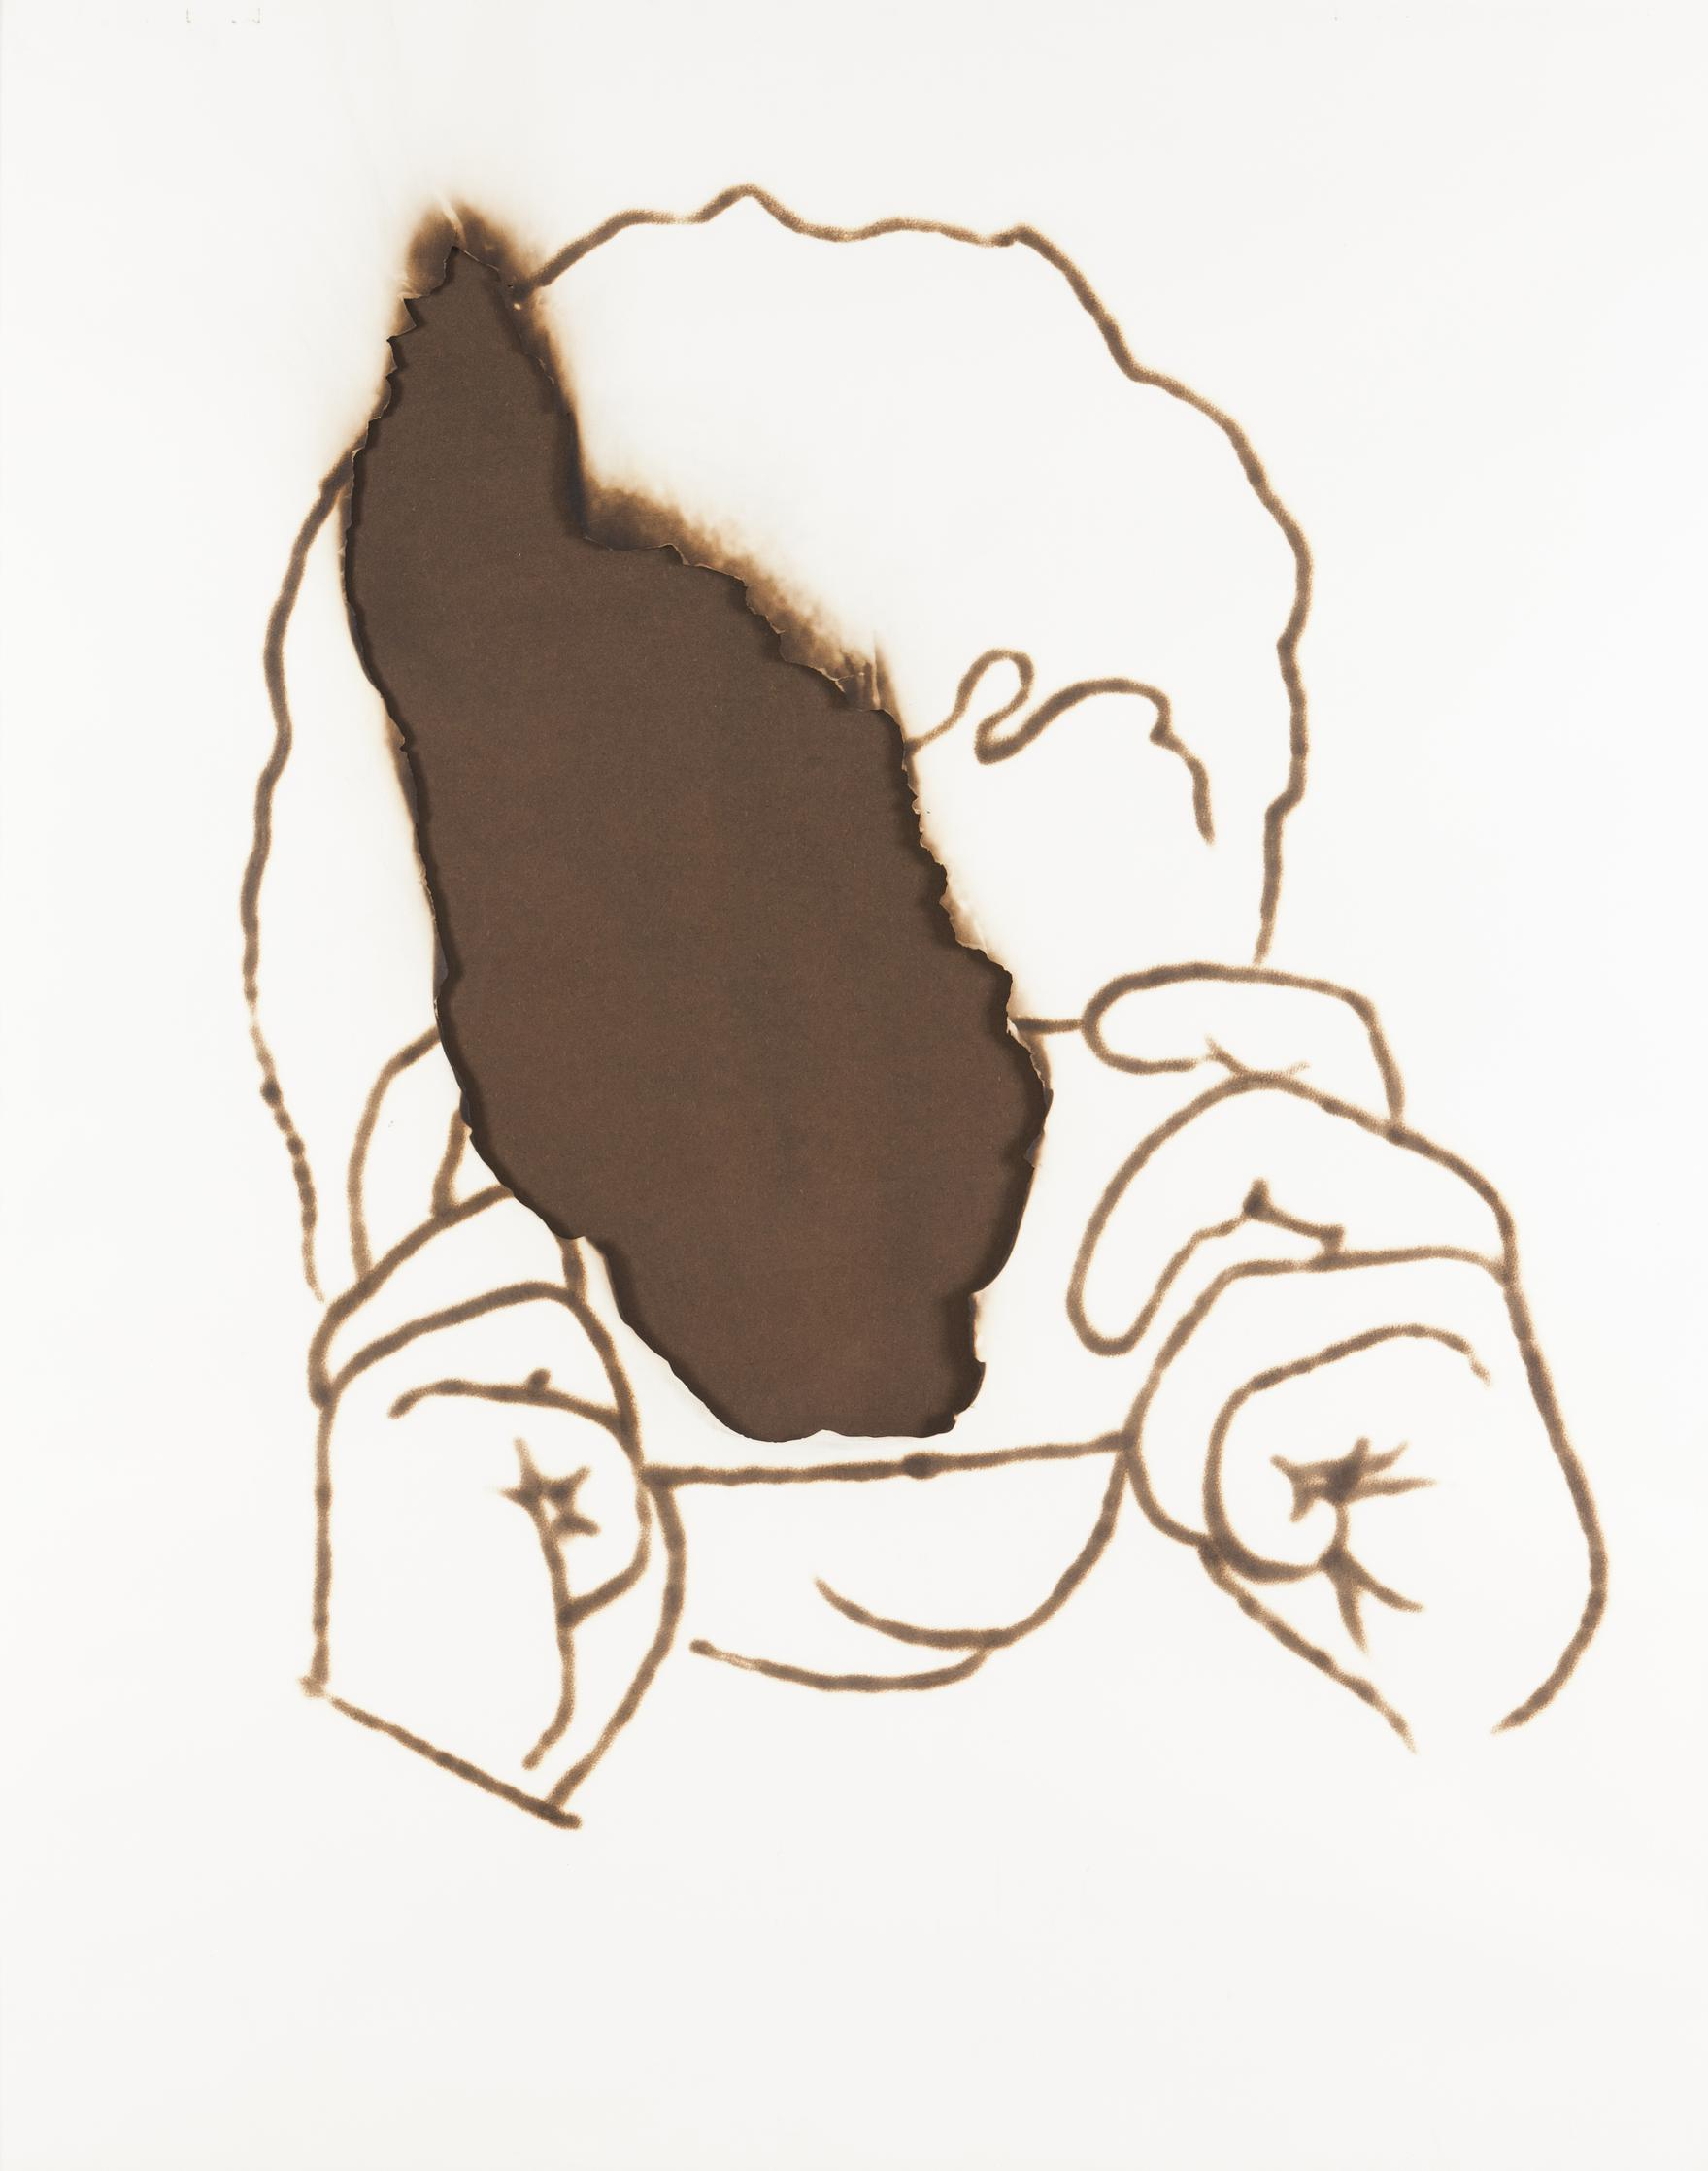 Pedro Gomes-Untitled-2001